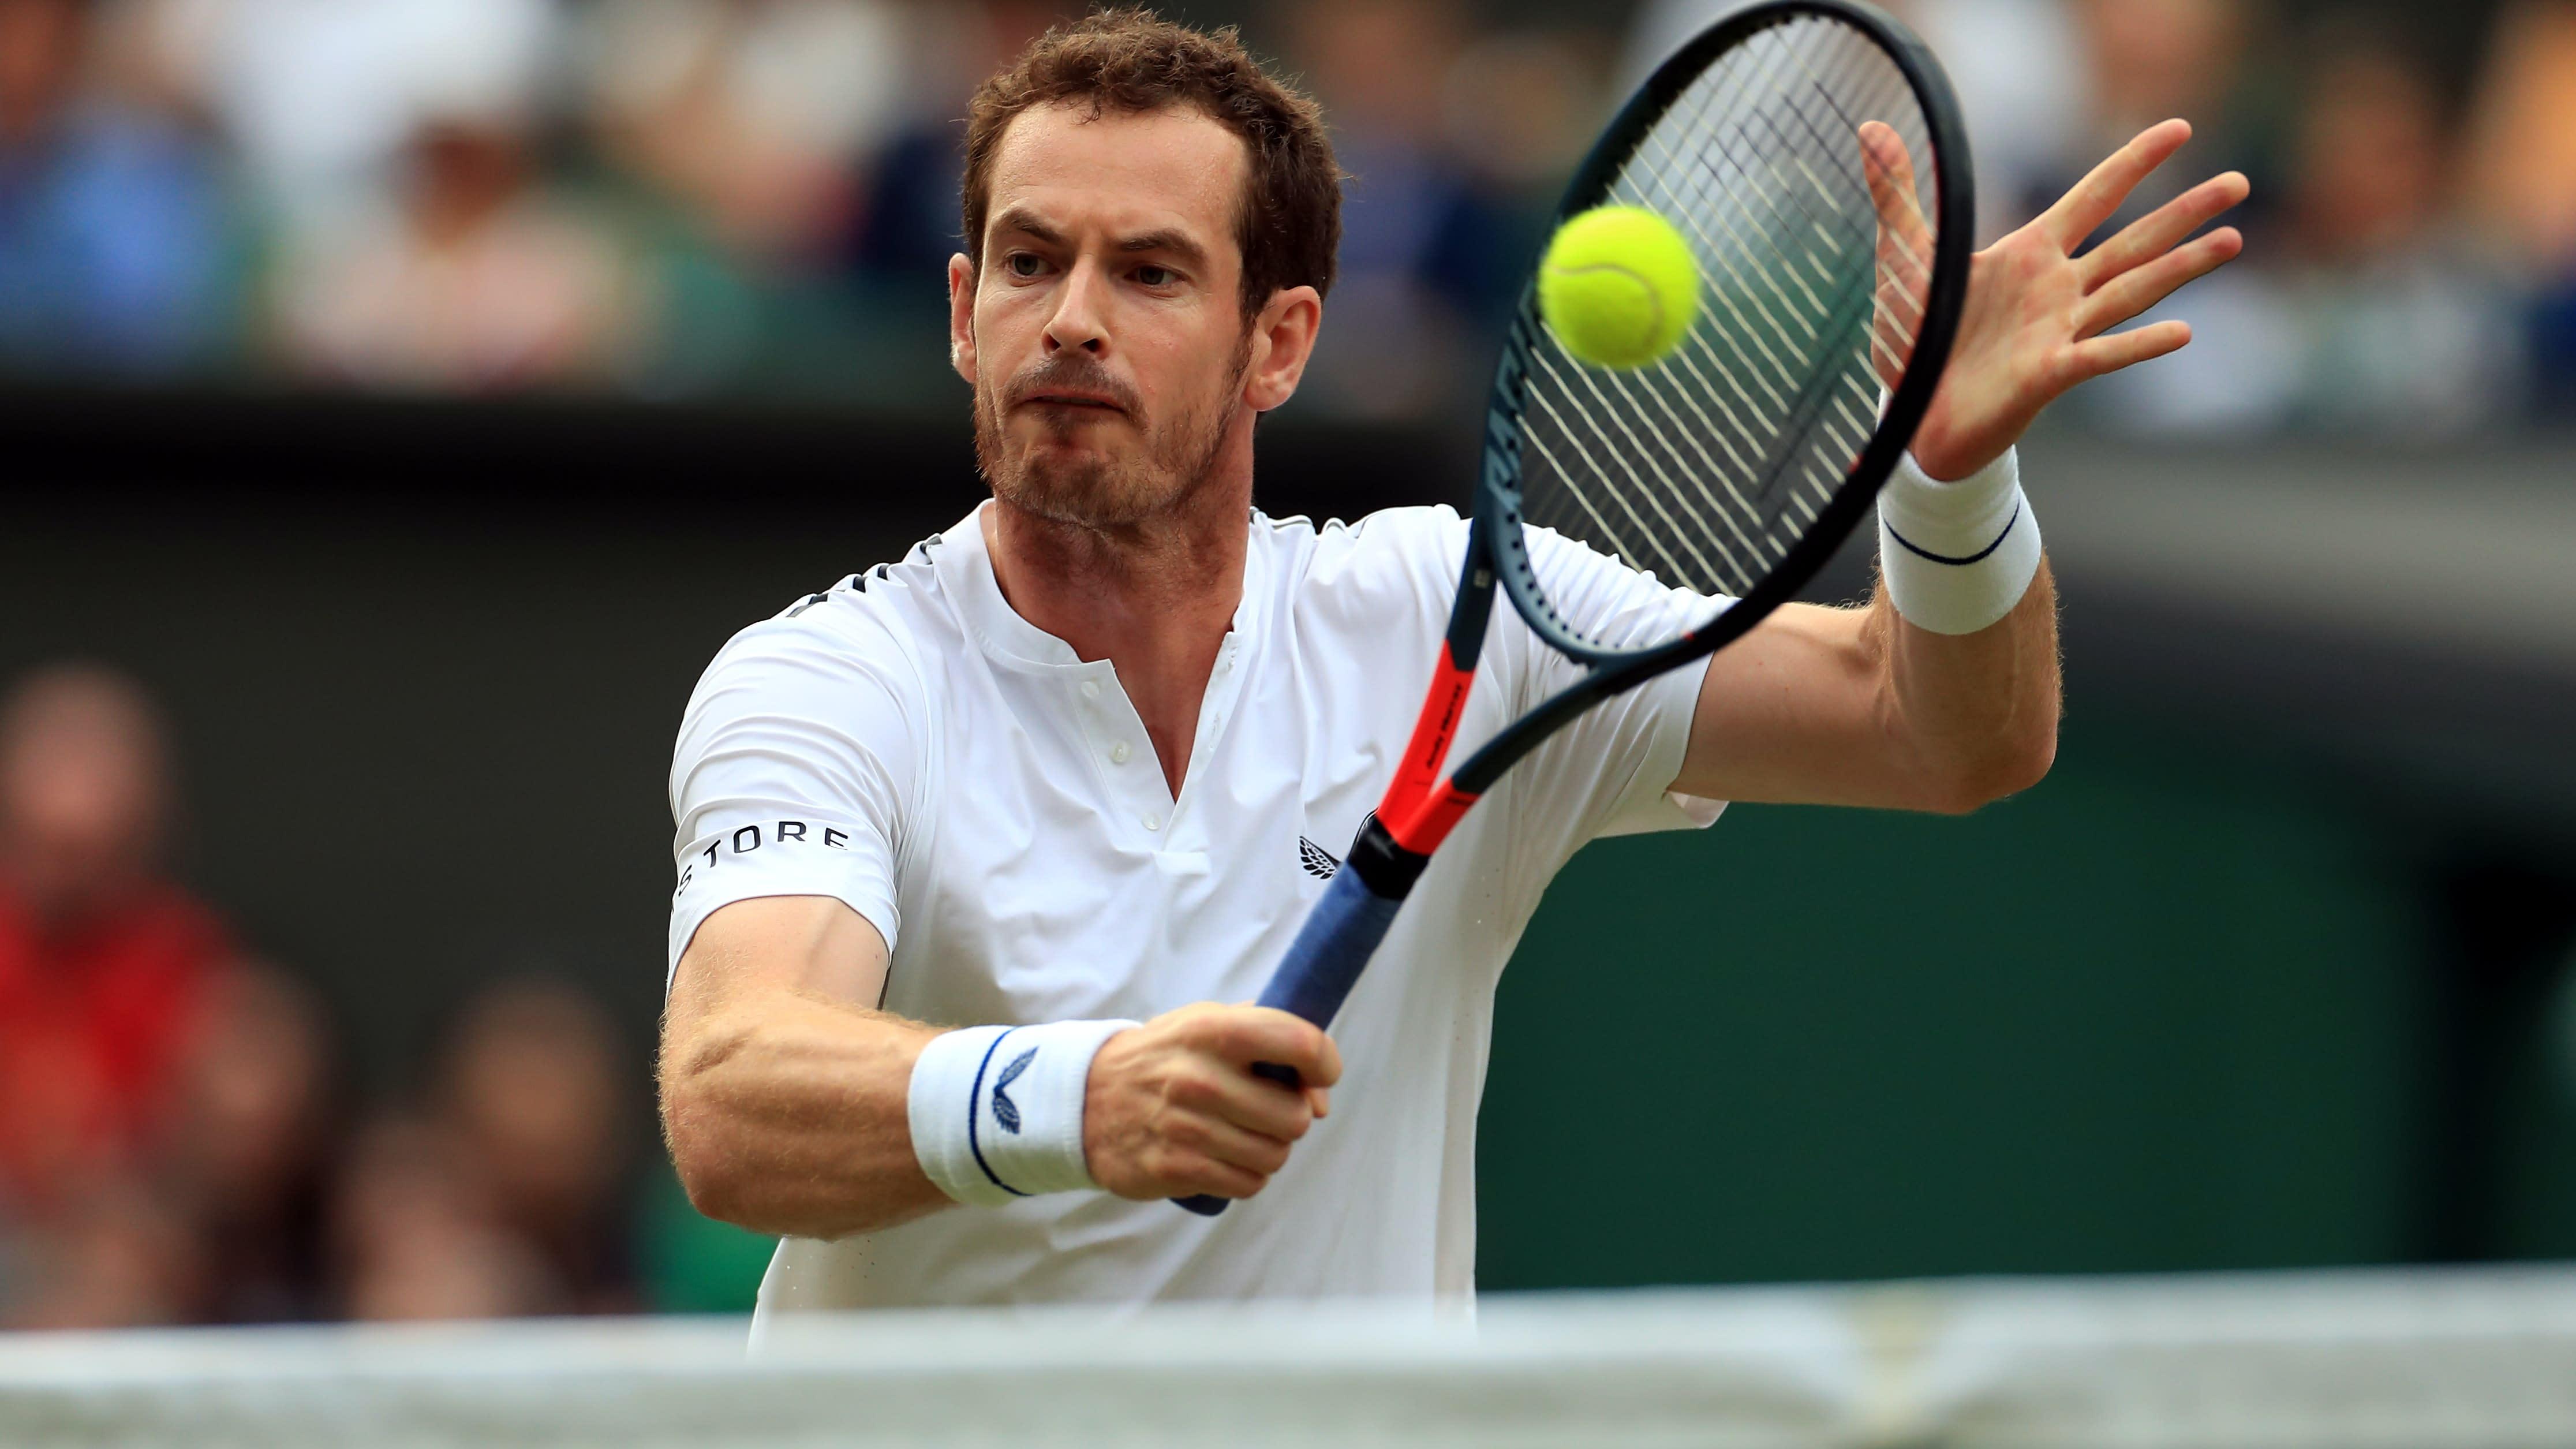 Andy Murray withdraws from bett1HULKS Championships because of injury